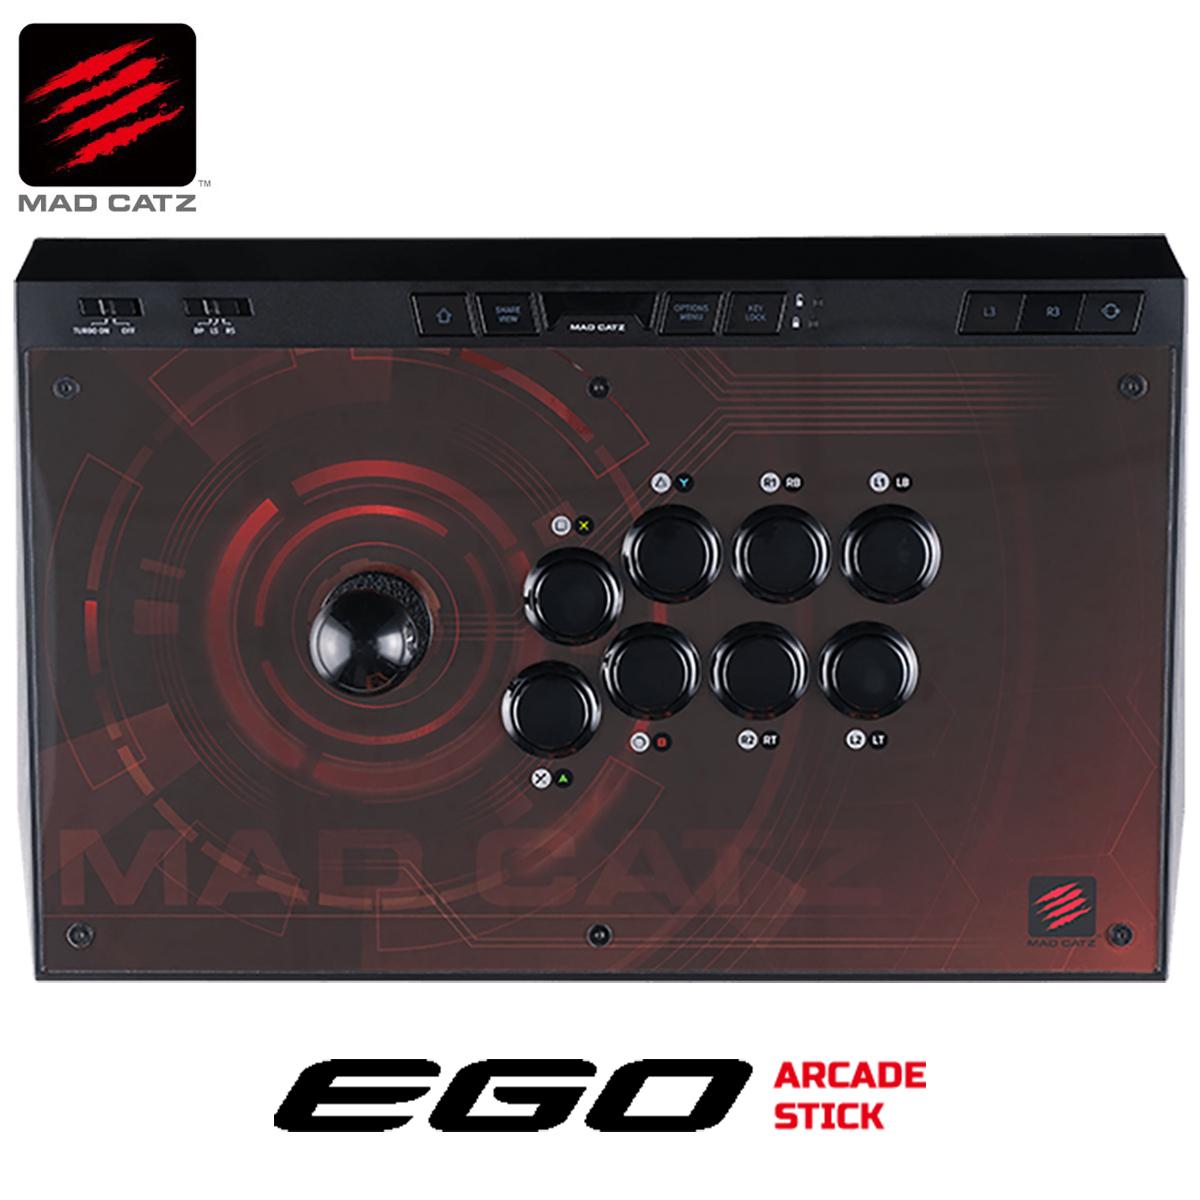 Mad Catz E.G.O. ARCADESTICK アーケードコントローラー アーケードスティック アケコン ファイティングスティック ジョイスティック エゴ 三和電子 GAPCCAINBL000-0J MADCATZ マッドキャッツ (12)